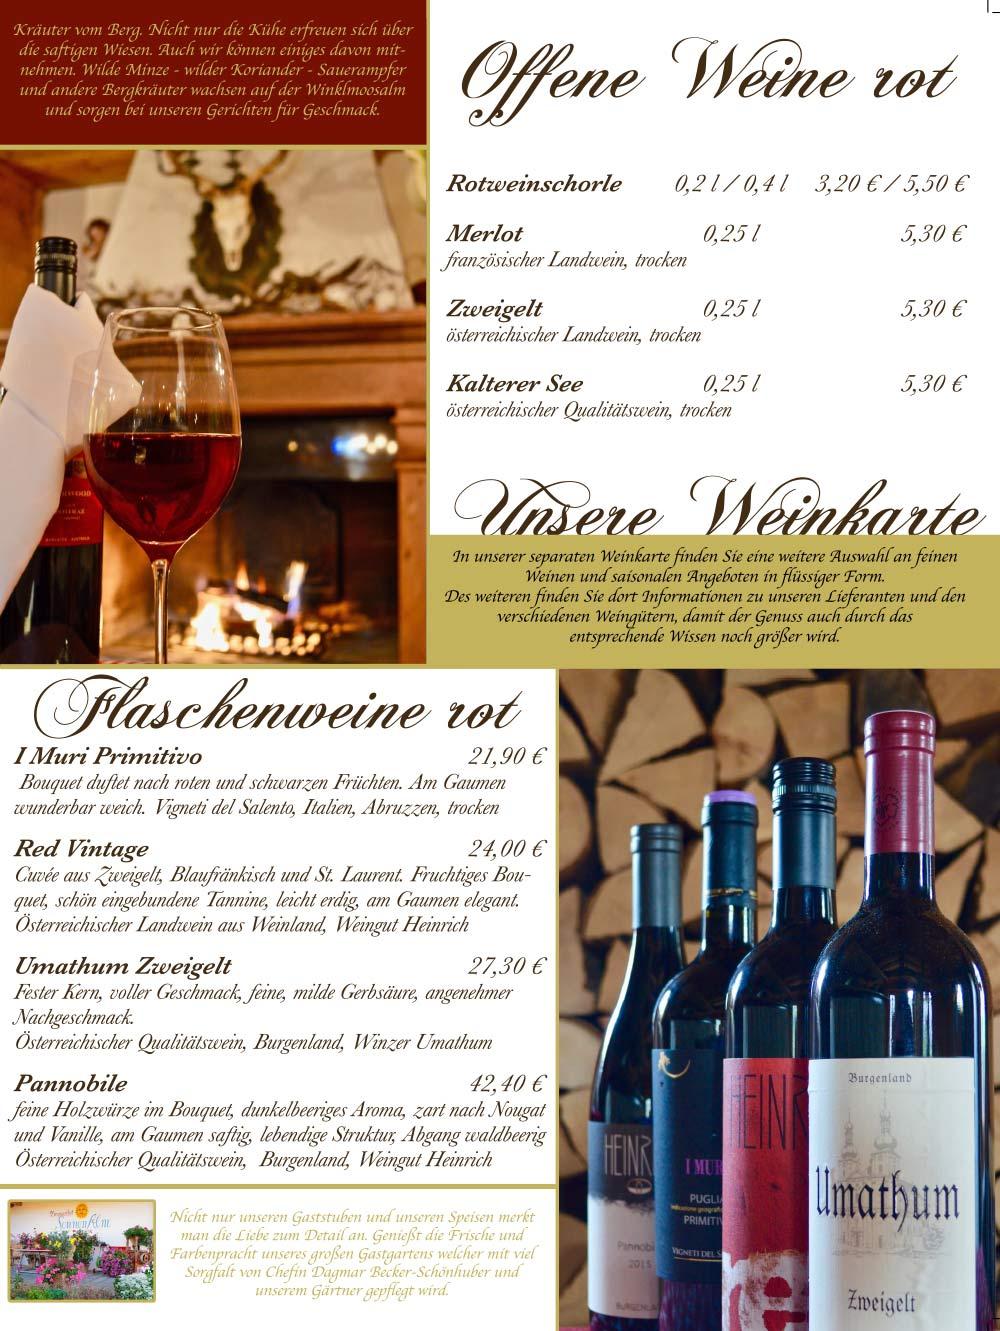 Speisekarte - Weinkarte